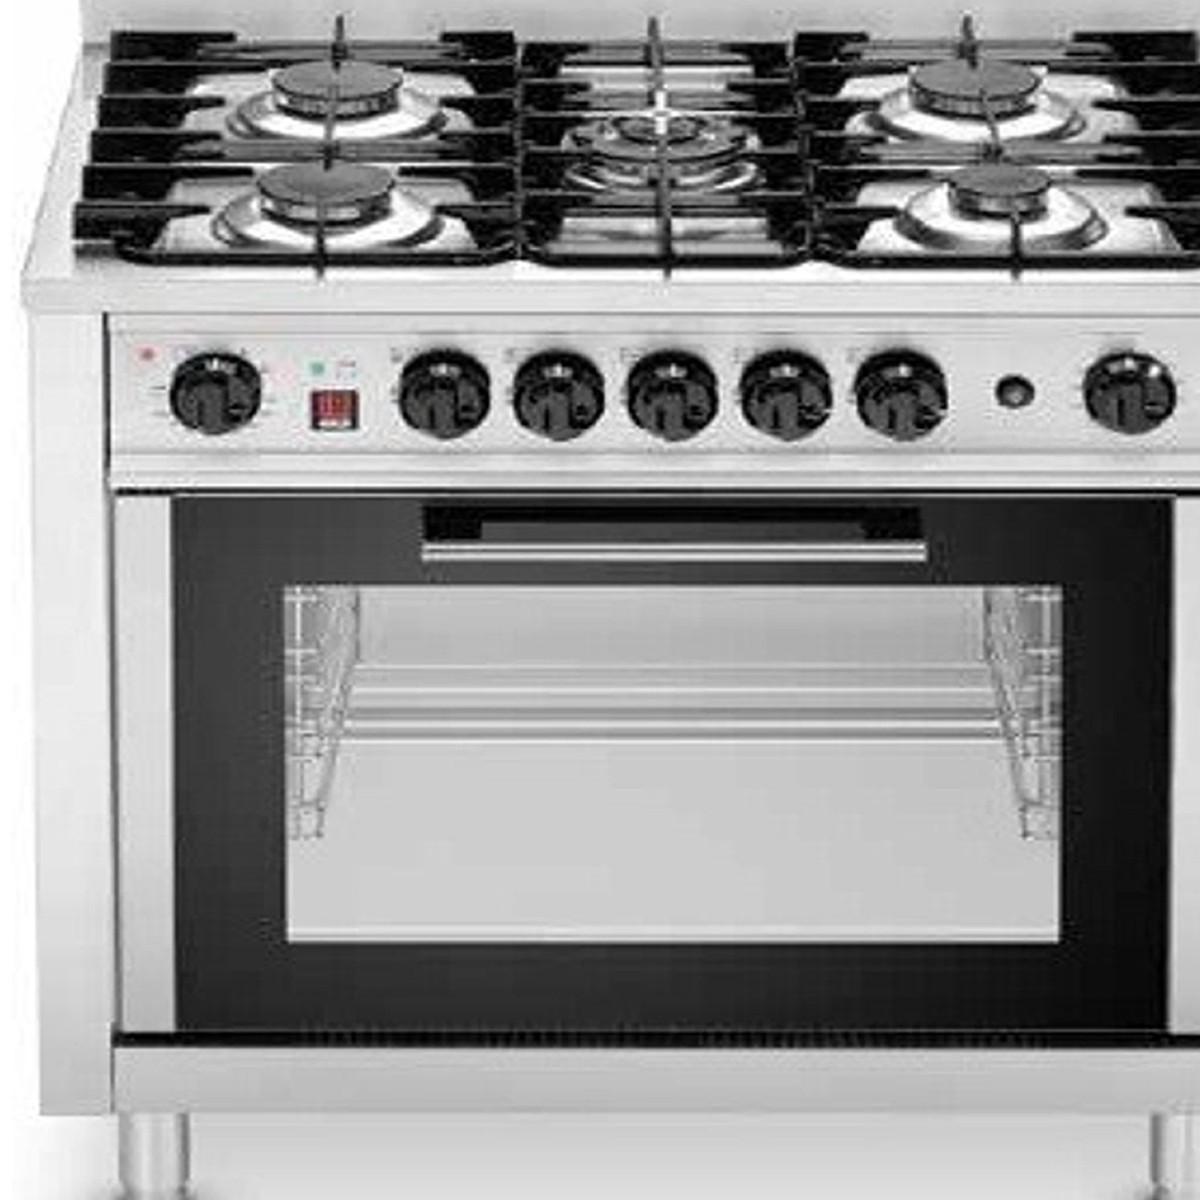 Cocina industrial a gas con 5 fuegos y horno trifasico for Cocinas con horno electrico